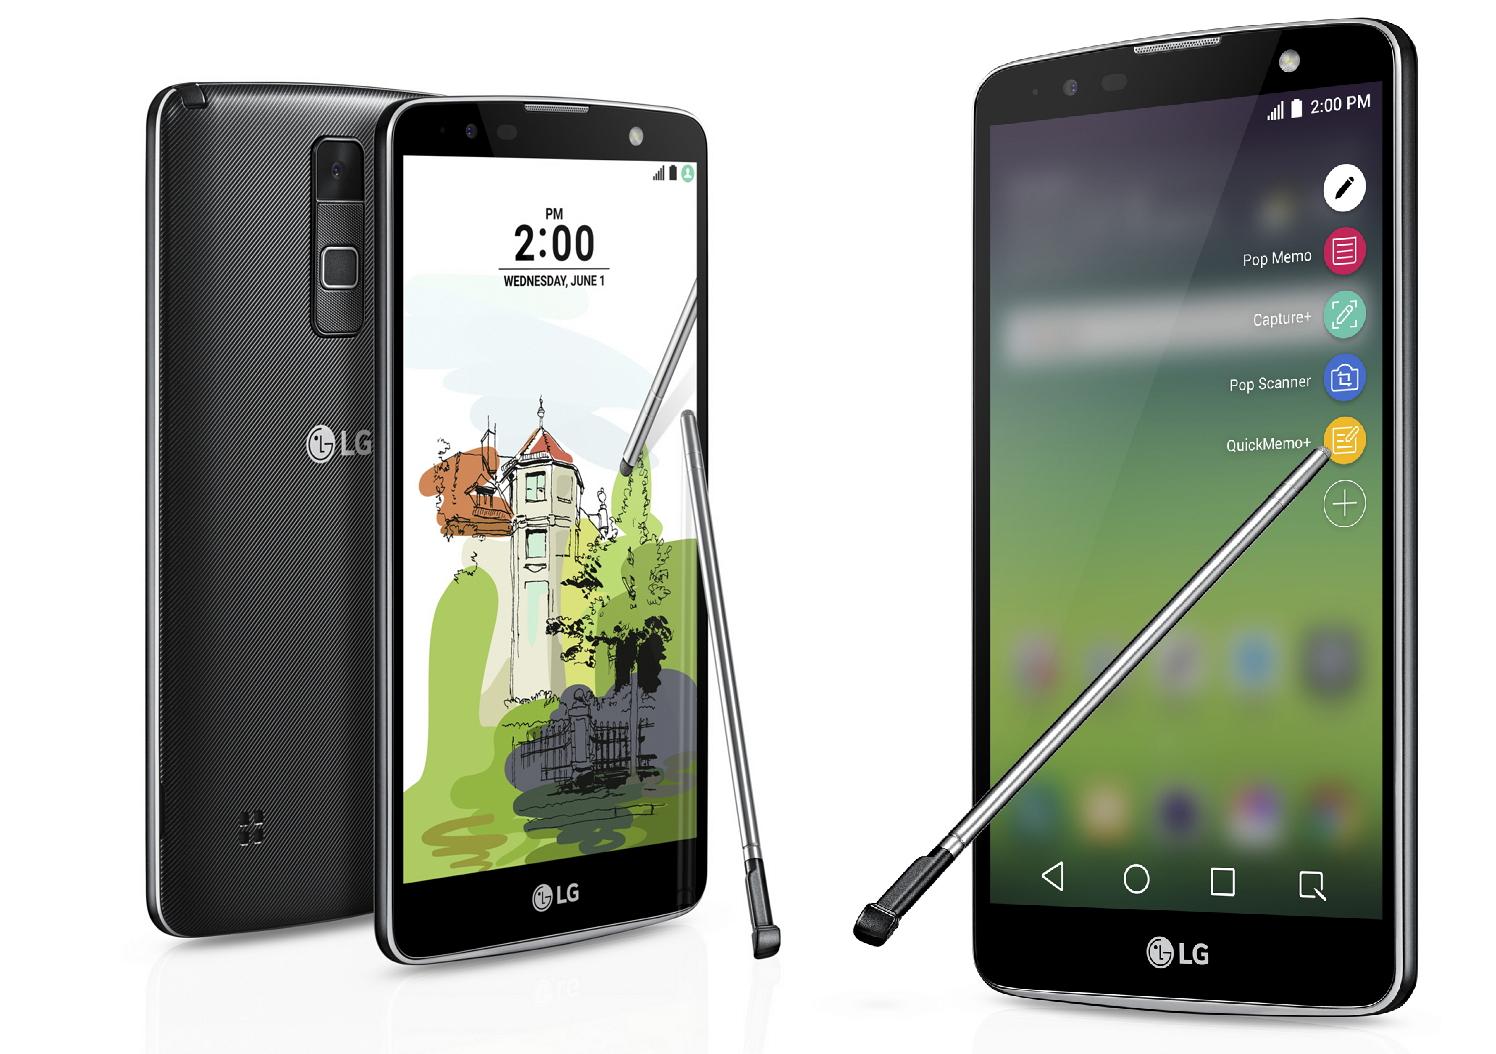 LG Stylus 02 Plus